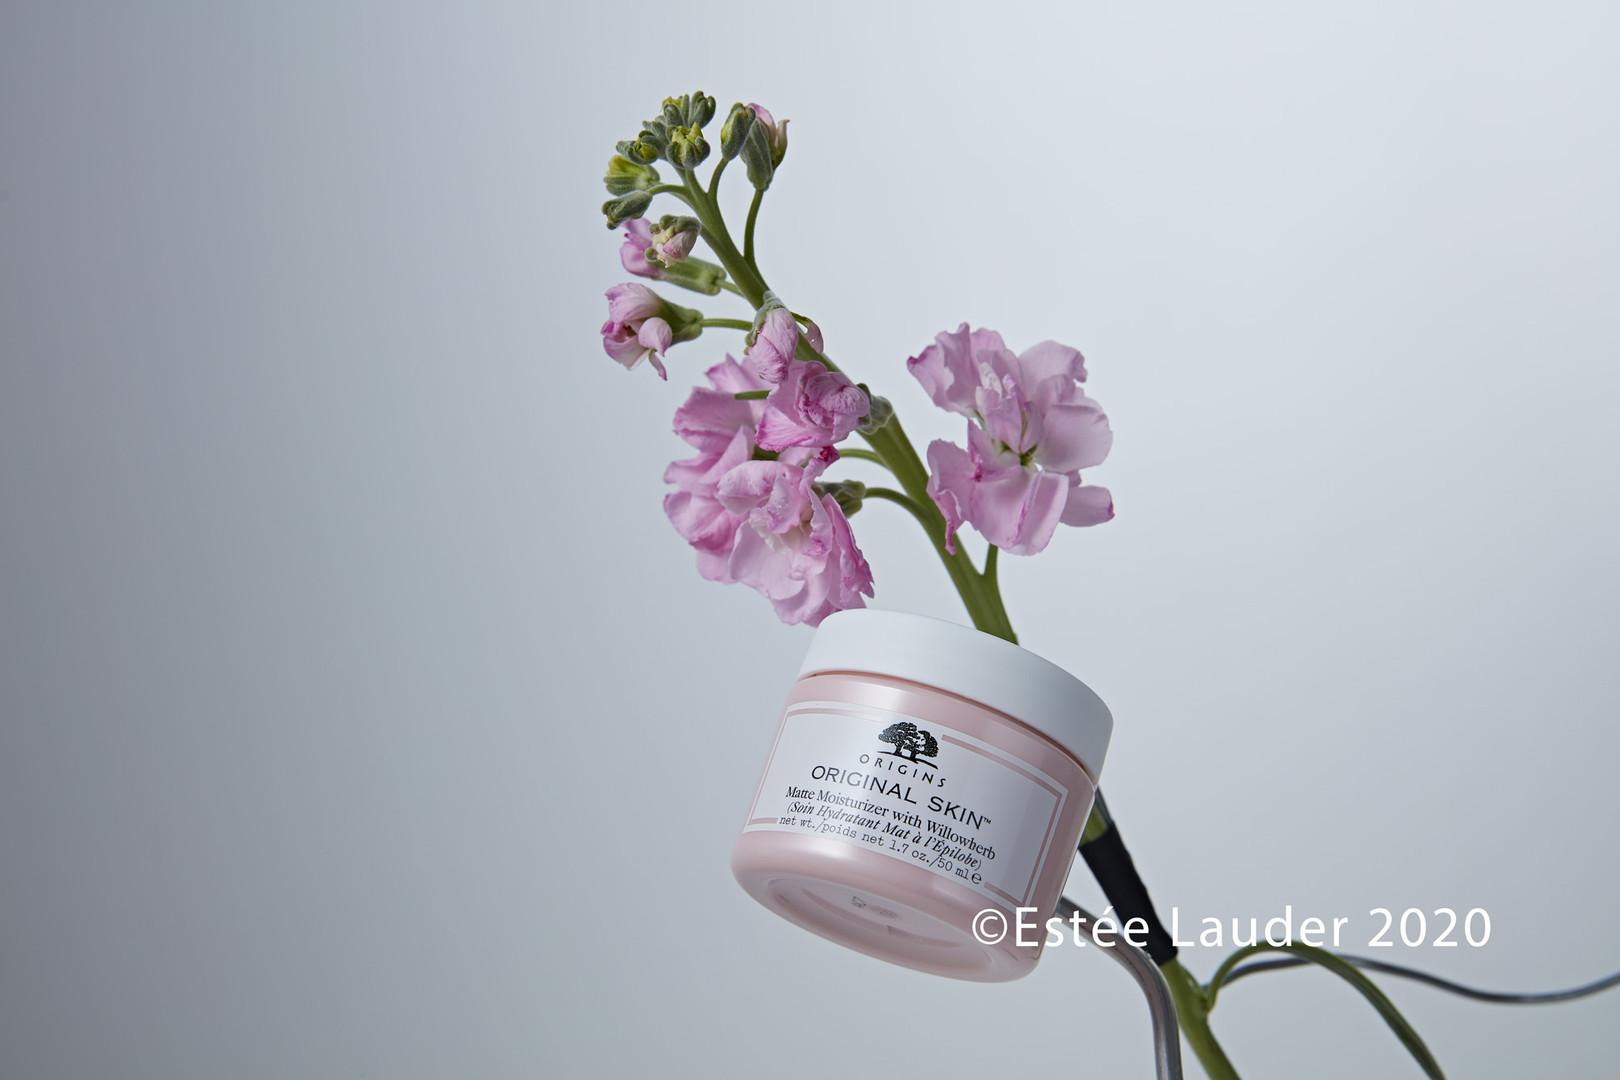 Origins-original-skin-moisturizer-Before